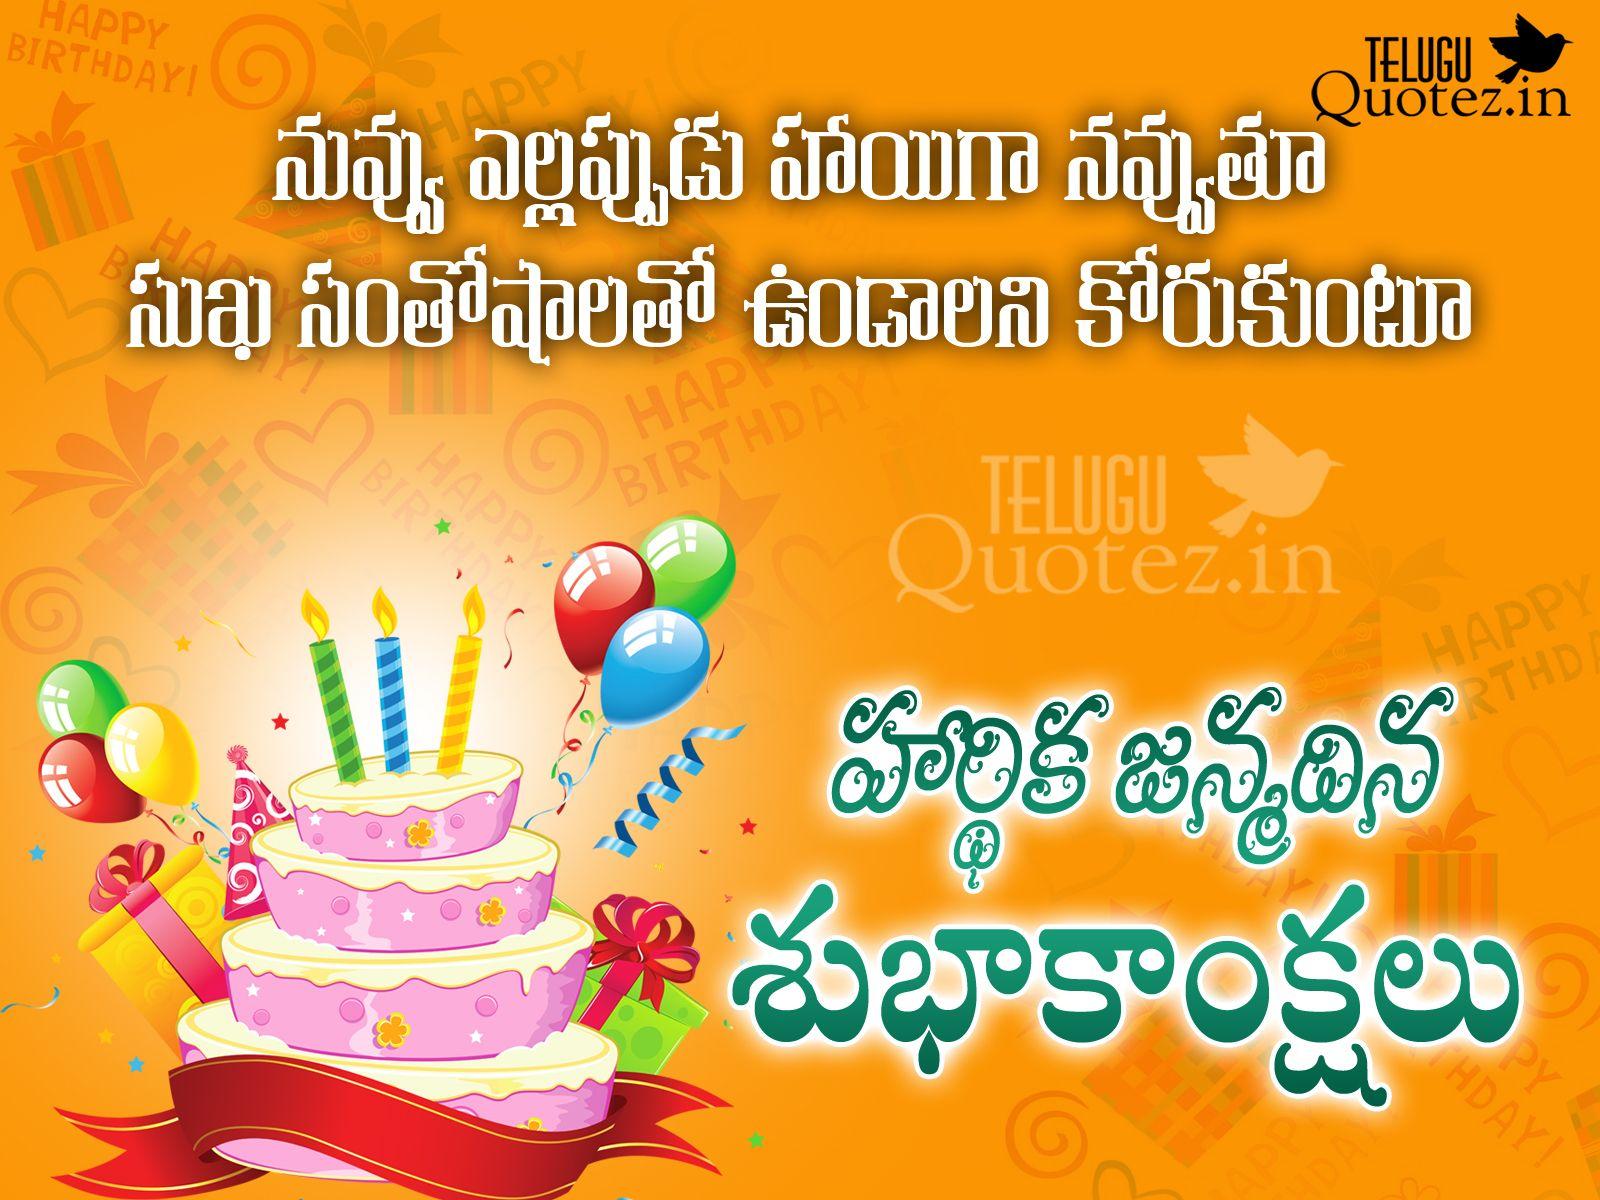 happy birthday wishes greeting in telugu language